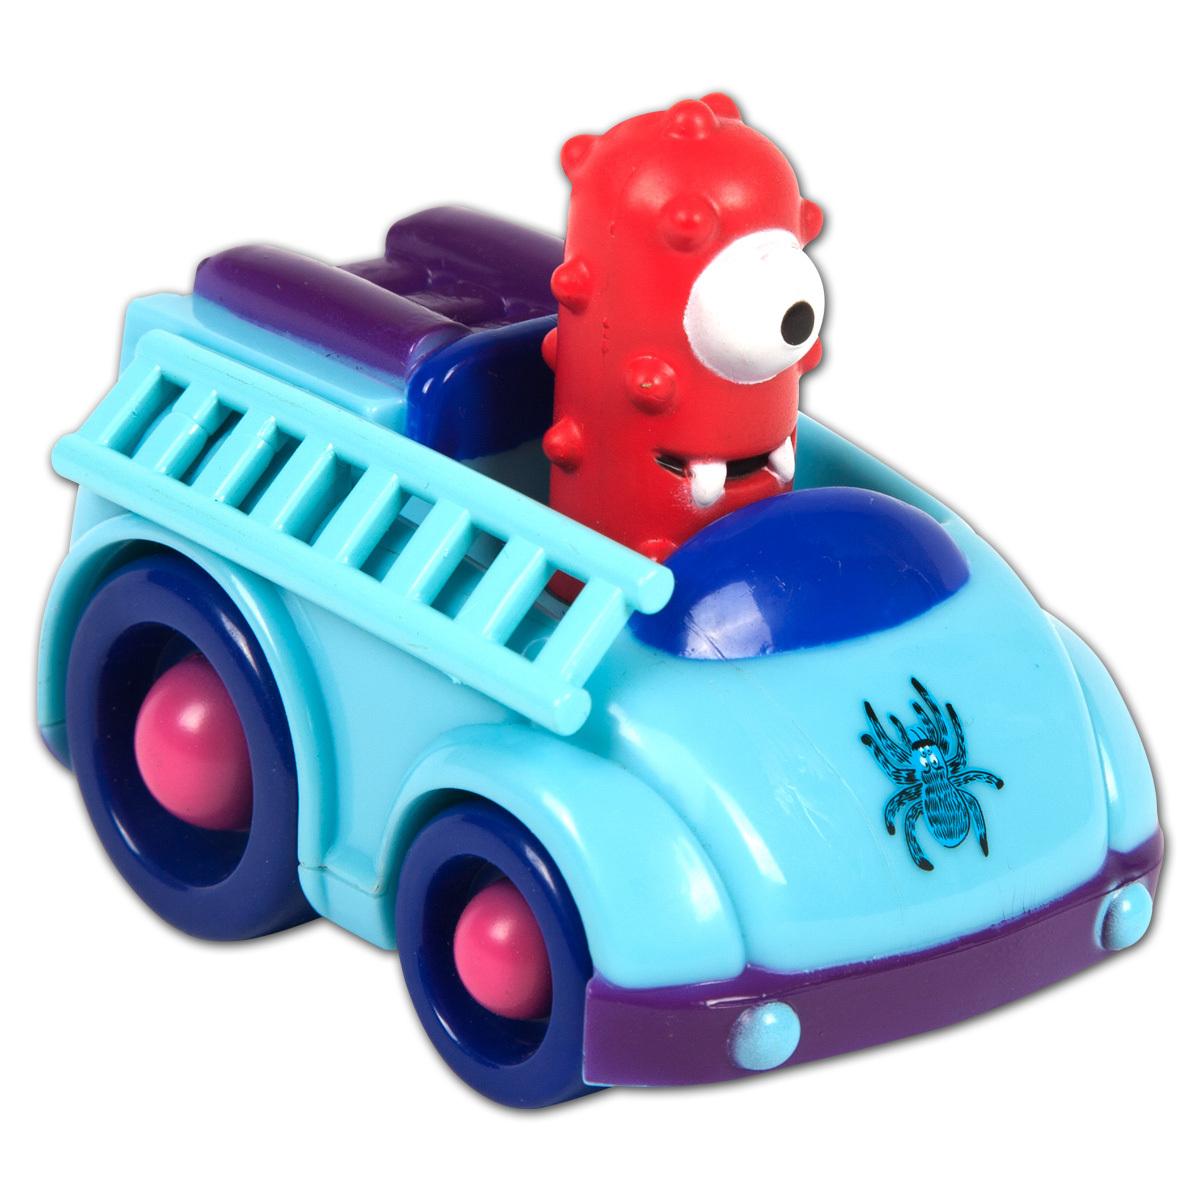 "Yo Gabba Gabba! 4"" Mobile Vehicle Muno"